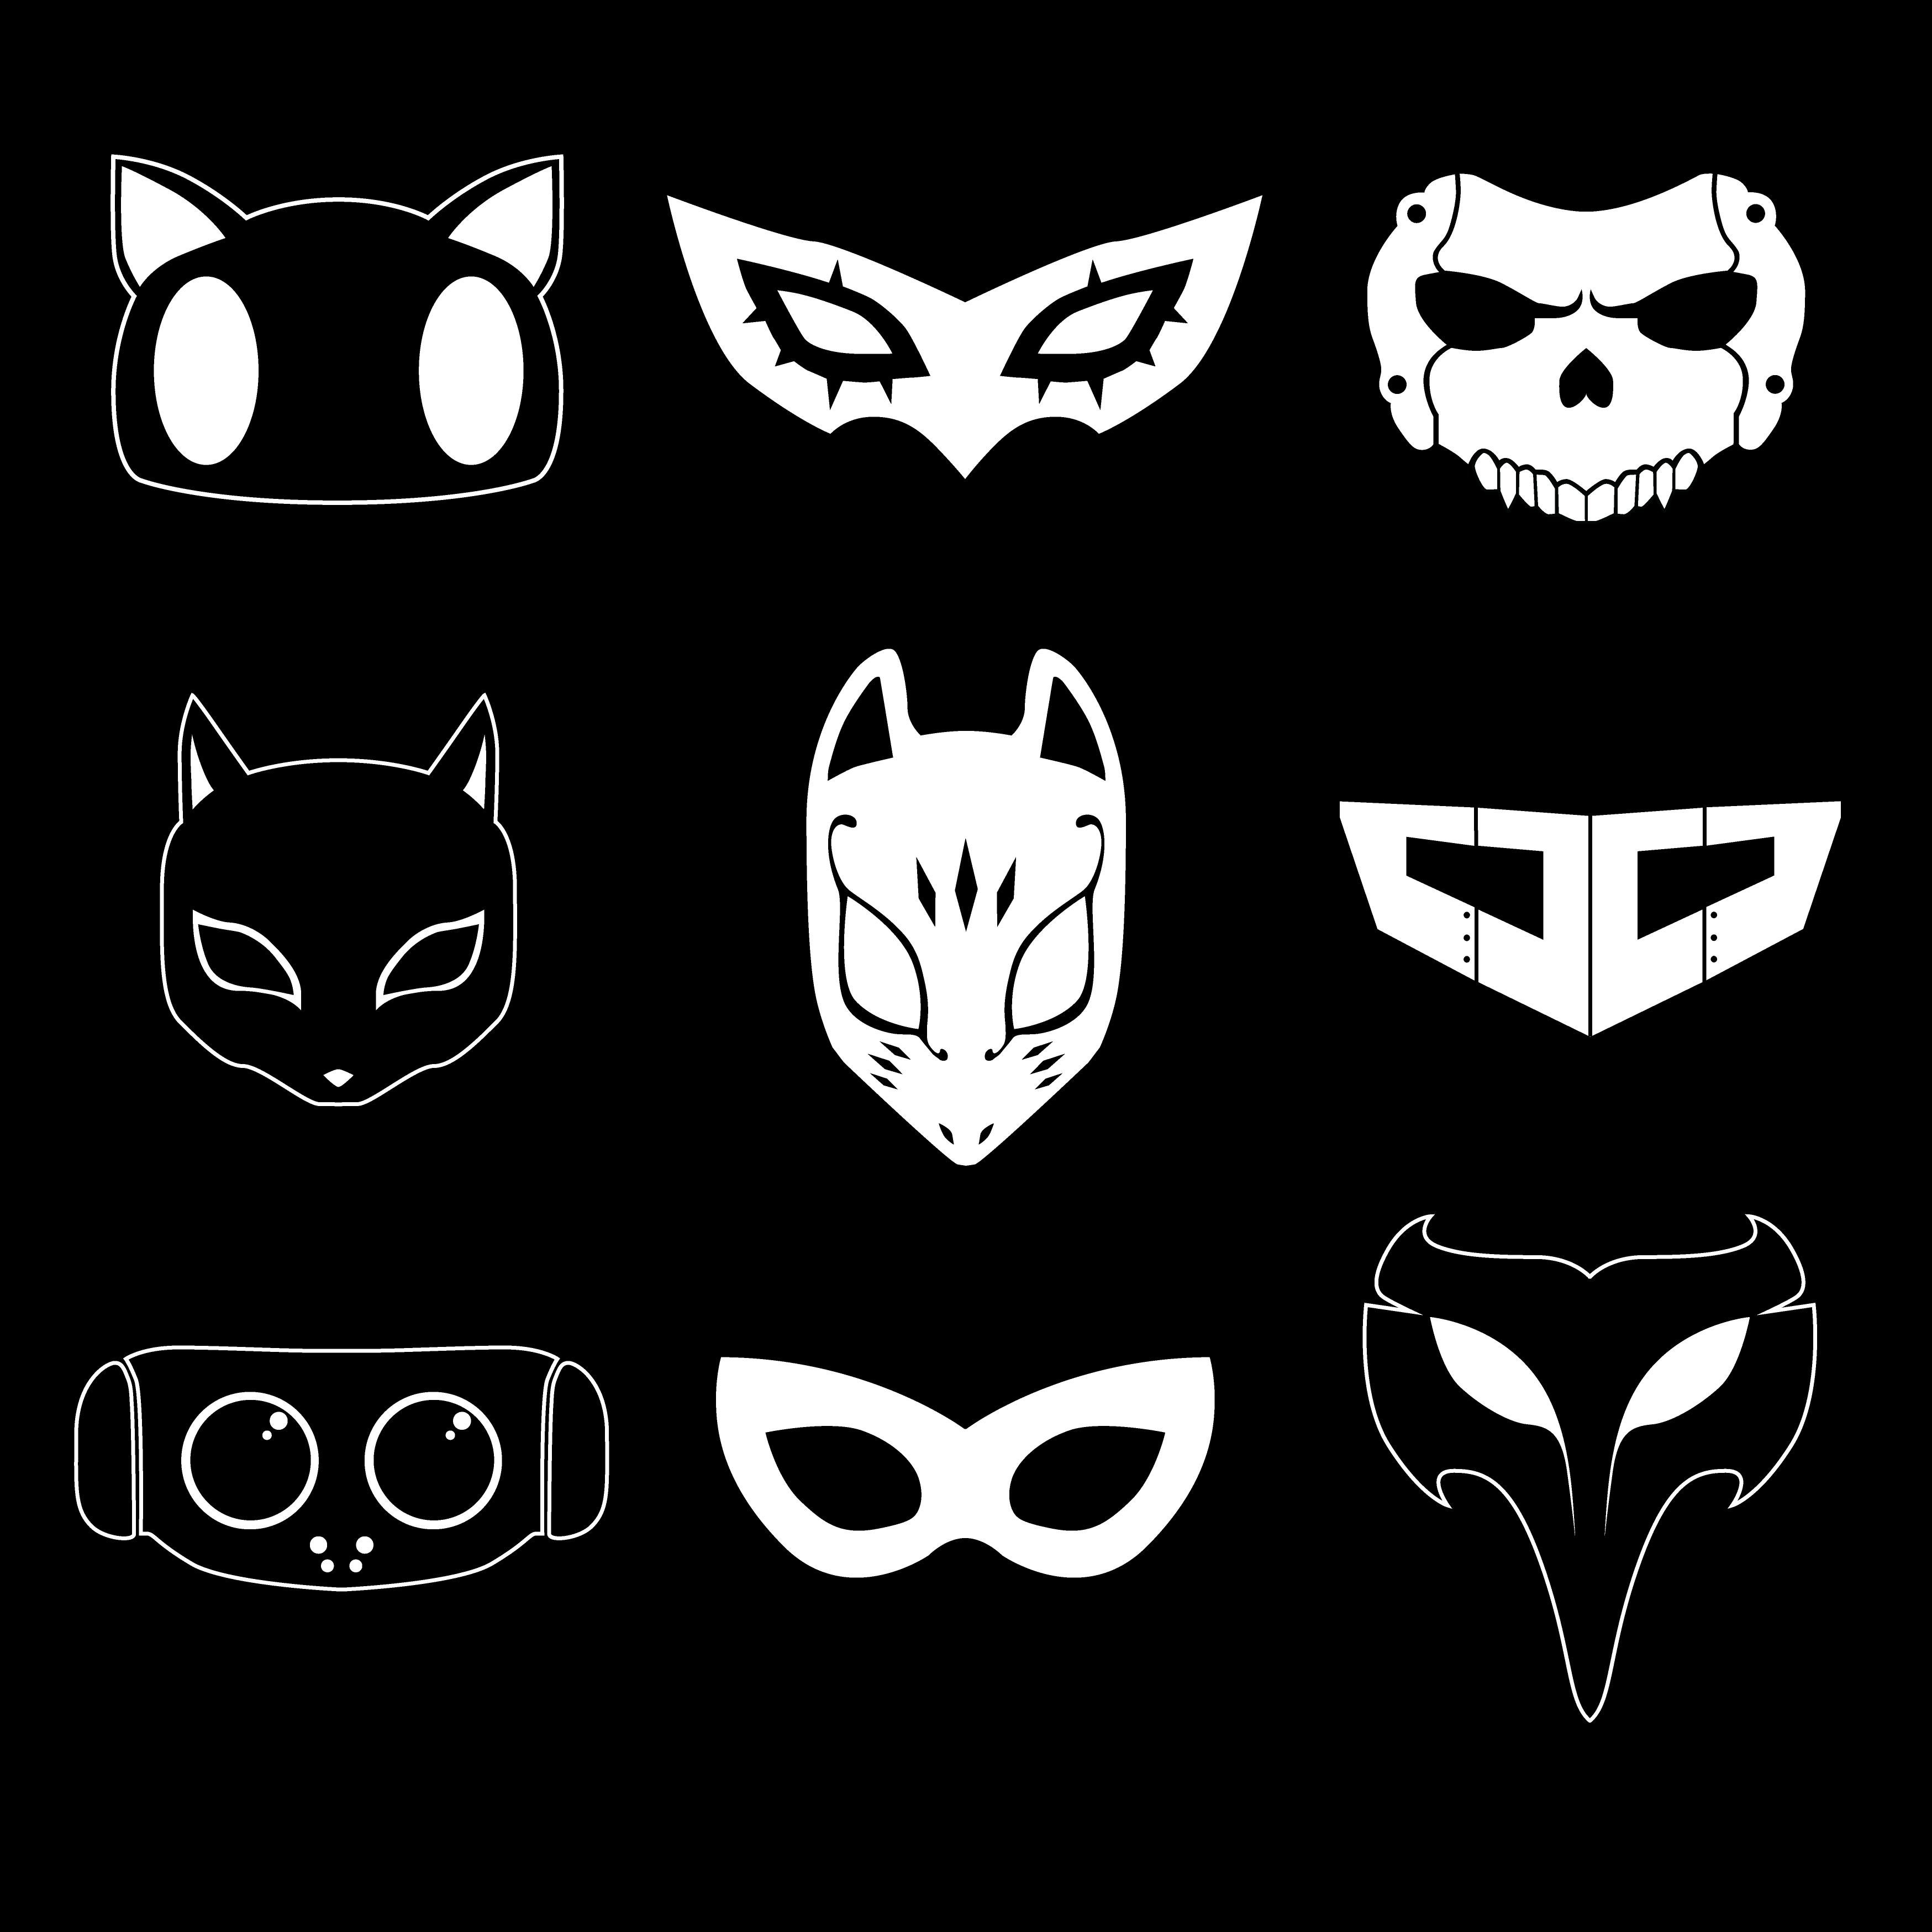 Persona 5 Masks Illustration Persona 5 Persona 5 Mask Persona 5 Joker